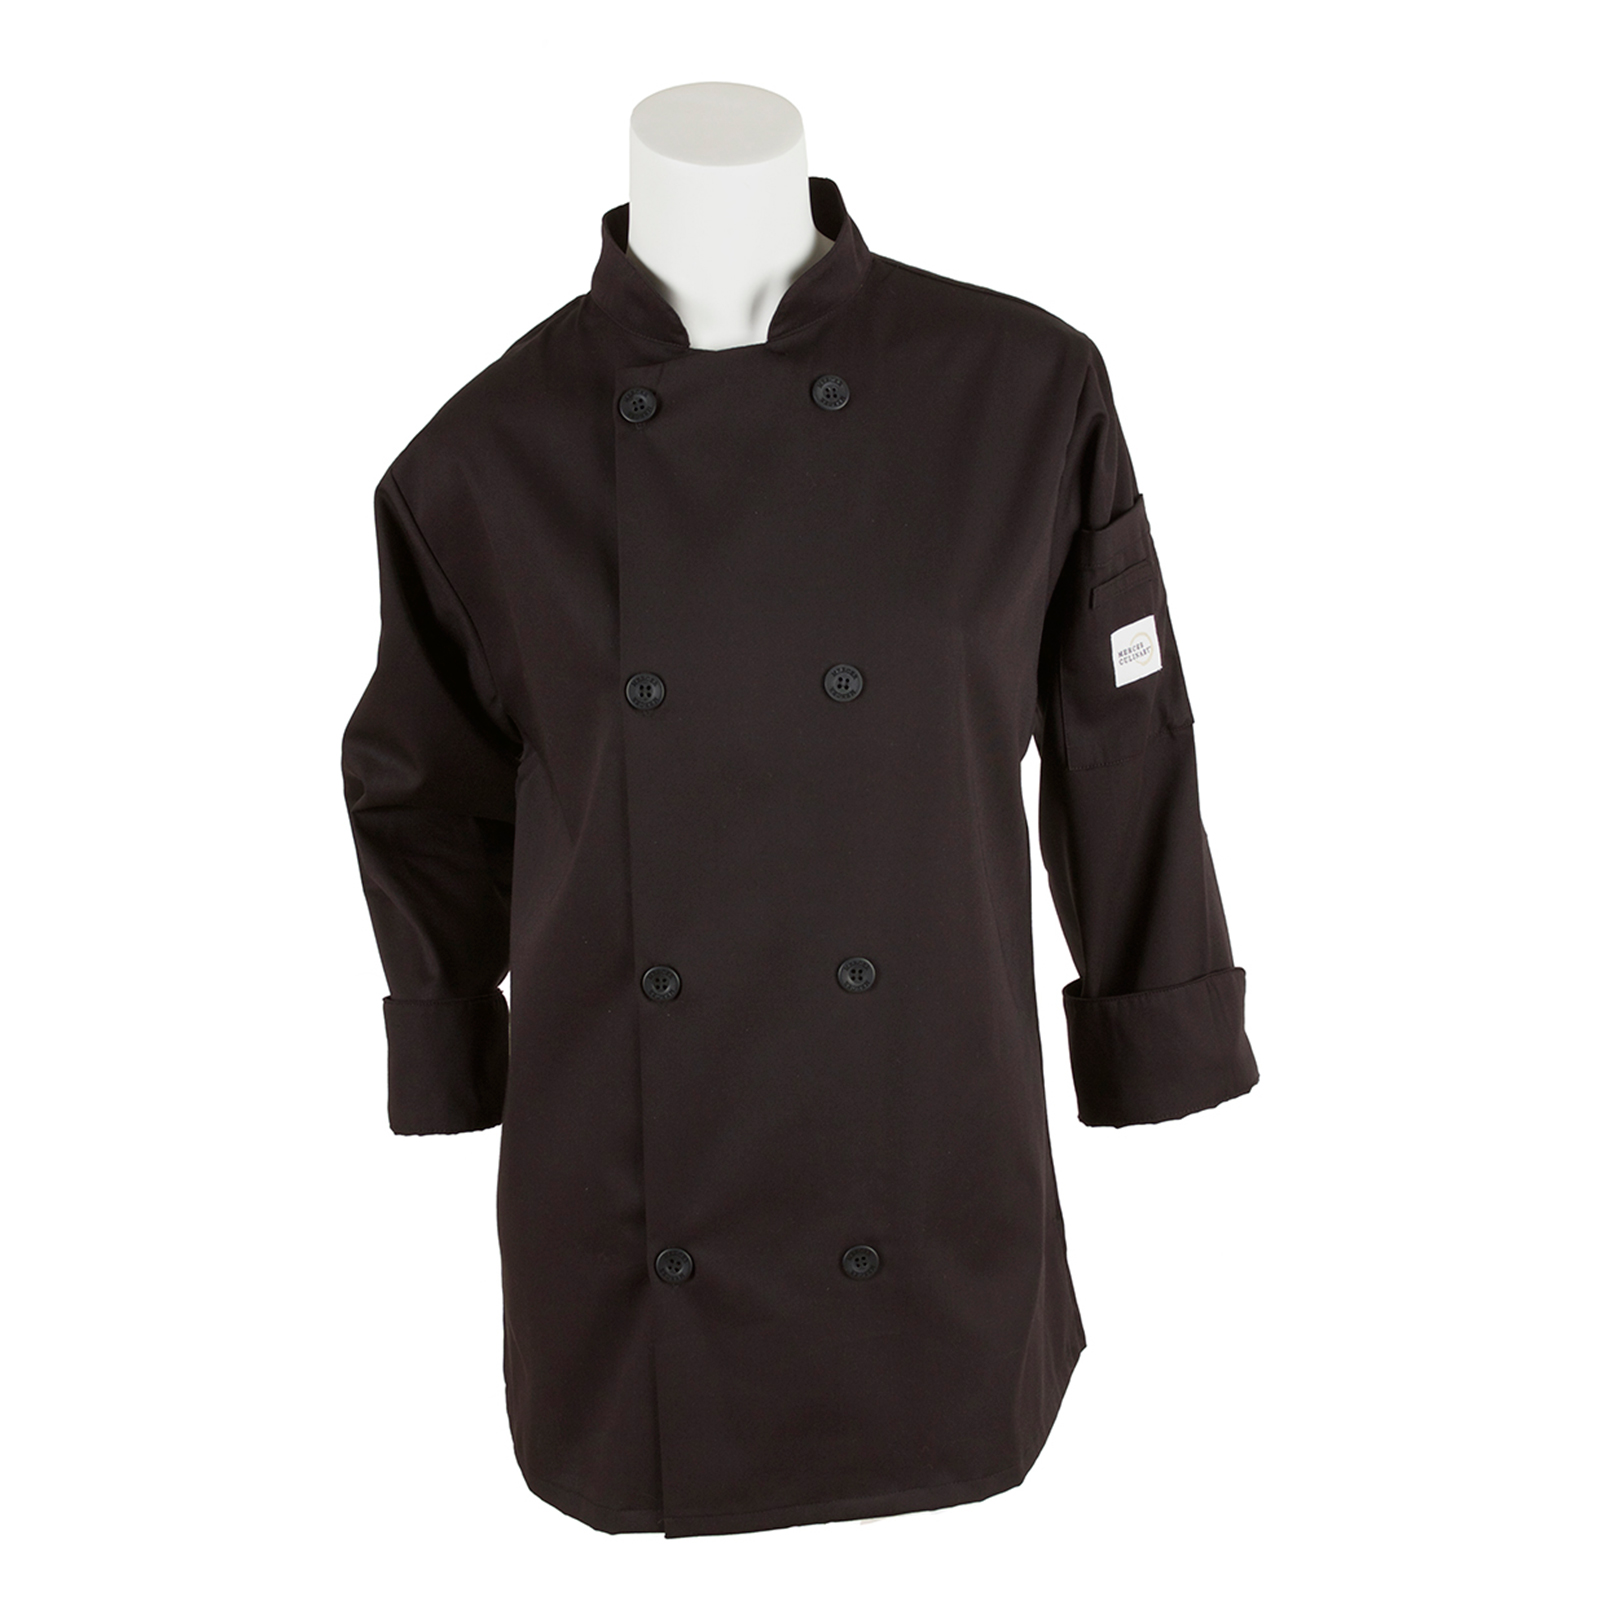 Mercer Culinary M60020BKS chef's coat